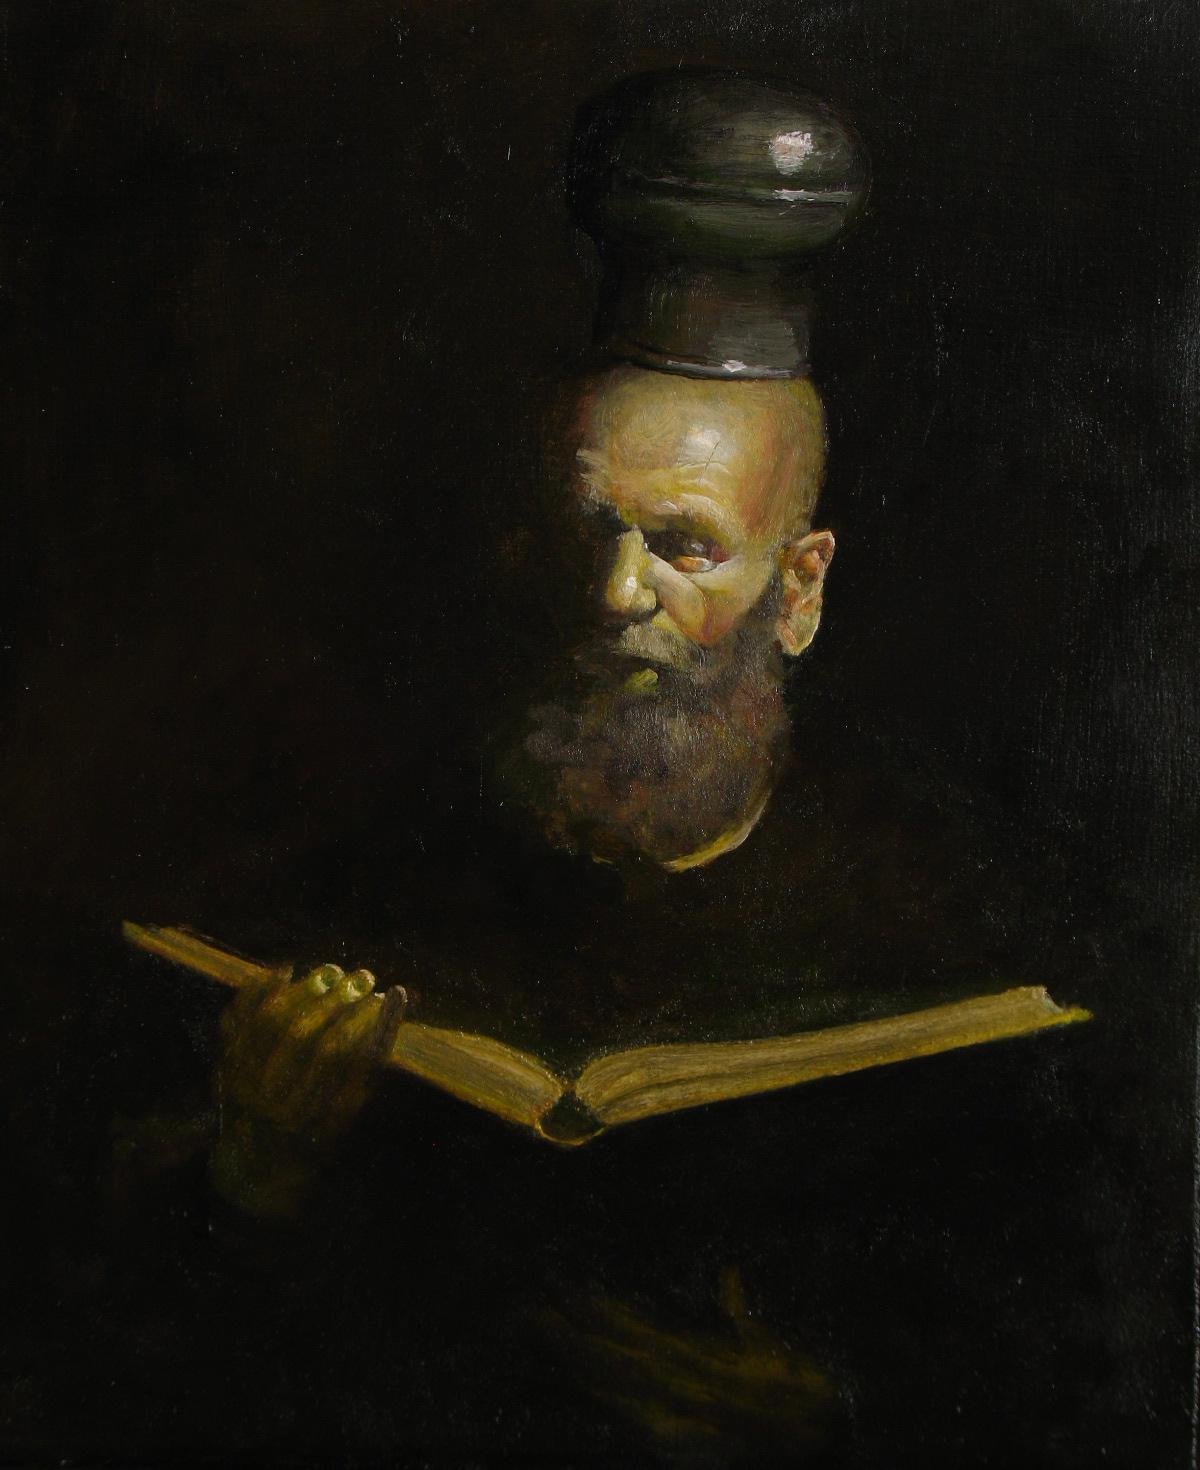 The Liturgy, 50x60cm, 2013